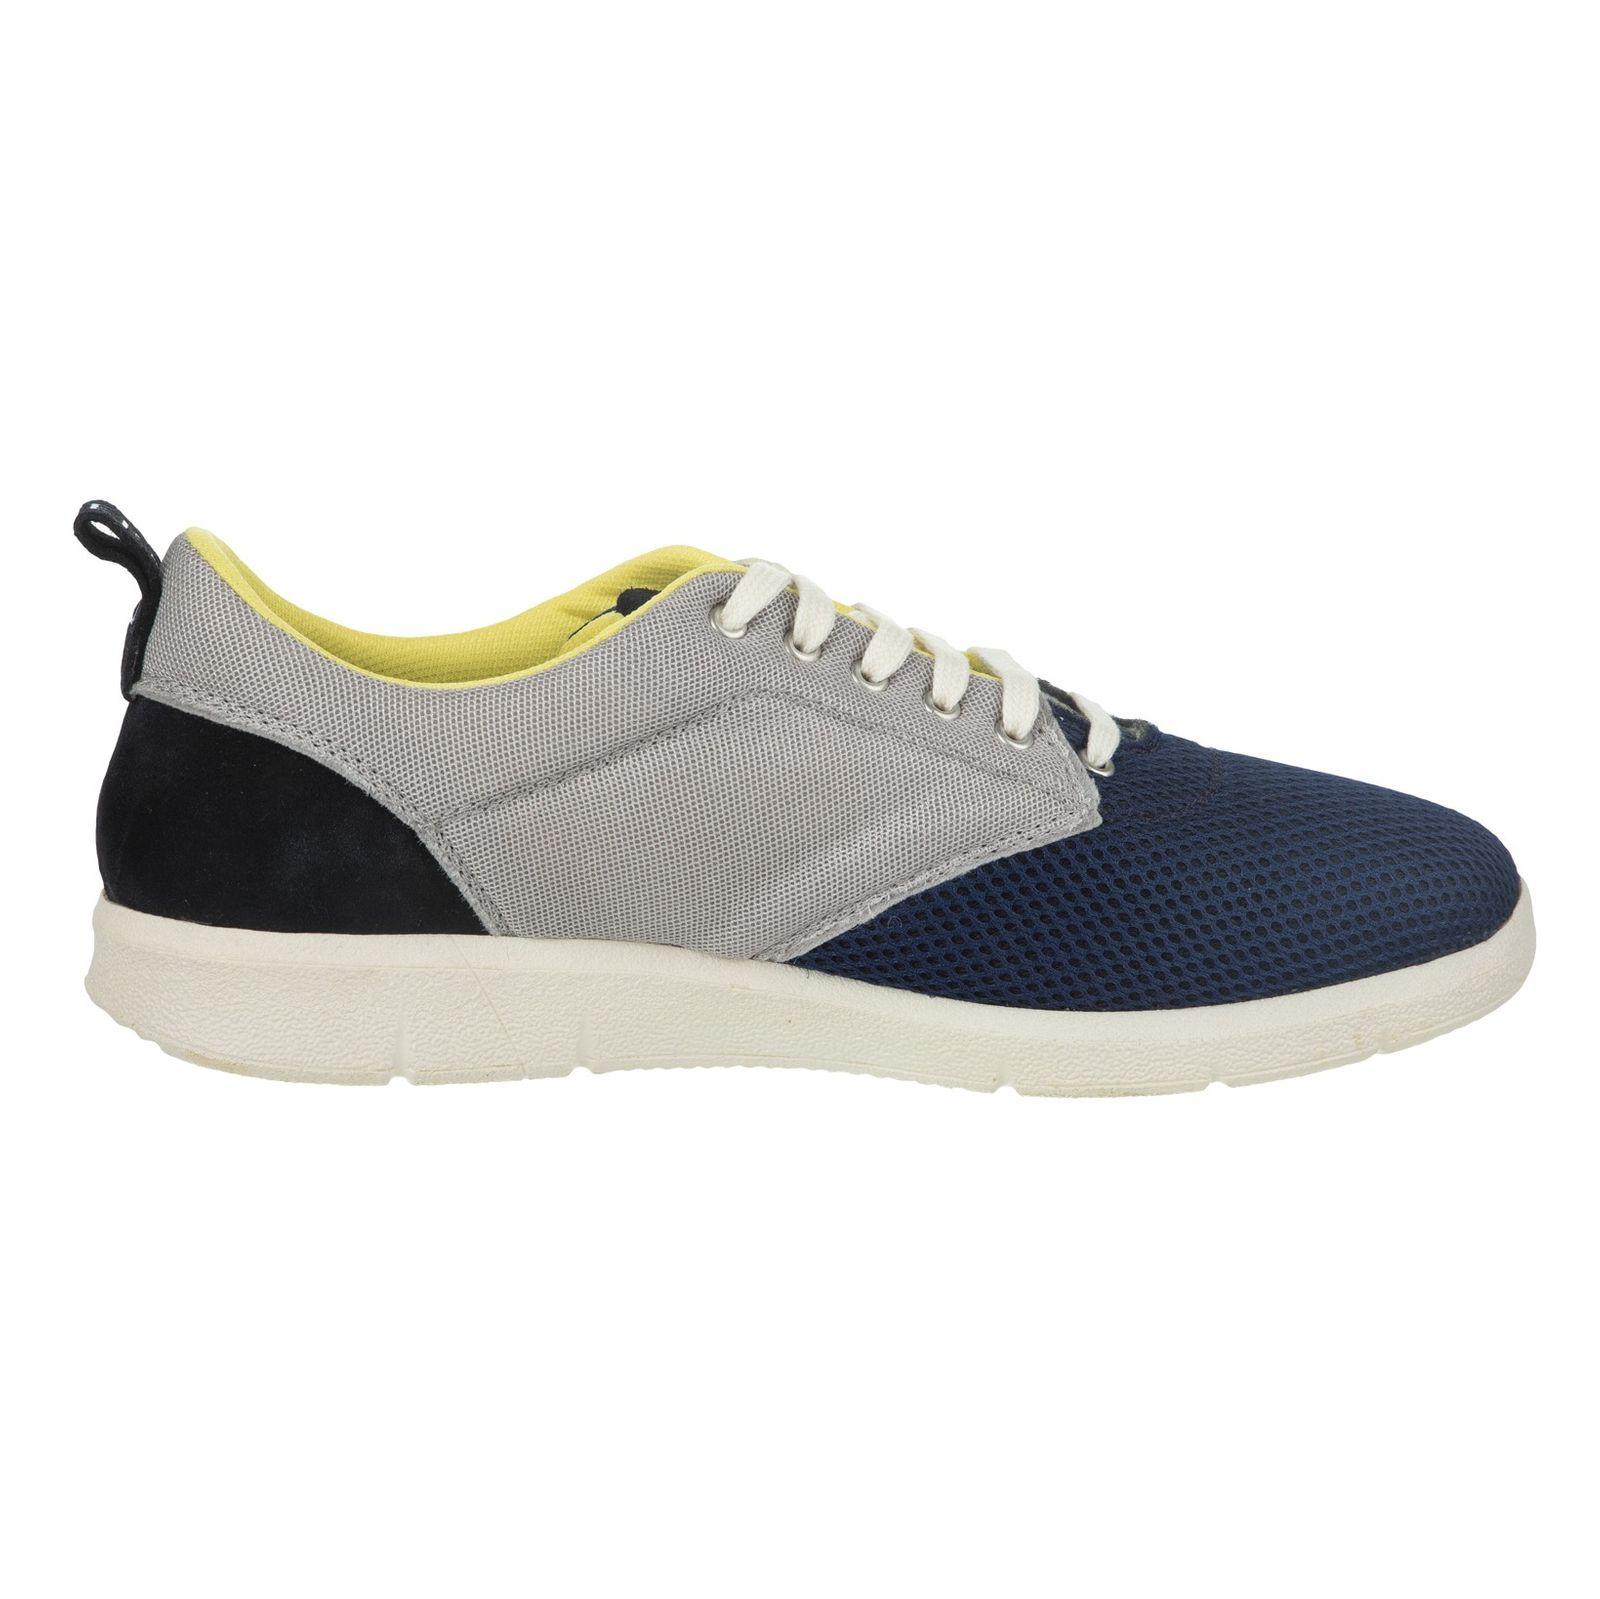 کفش روزمره مردانه داکرز مدل 100209331-101 - مشکی - 4